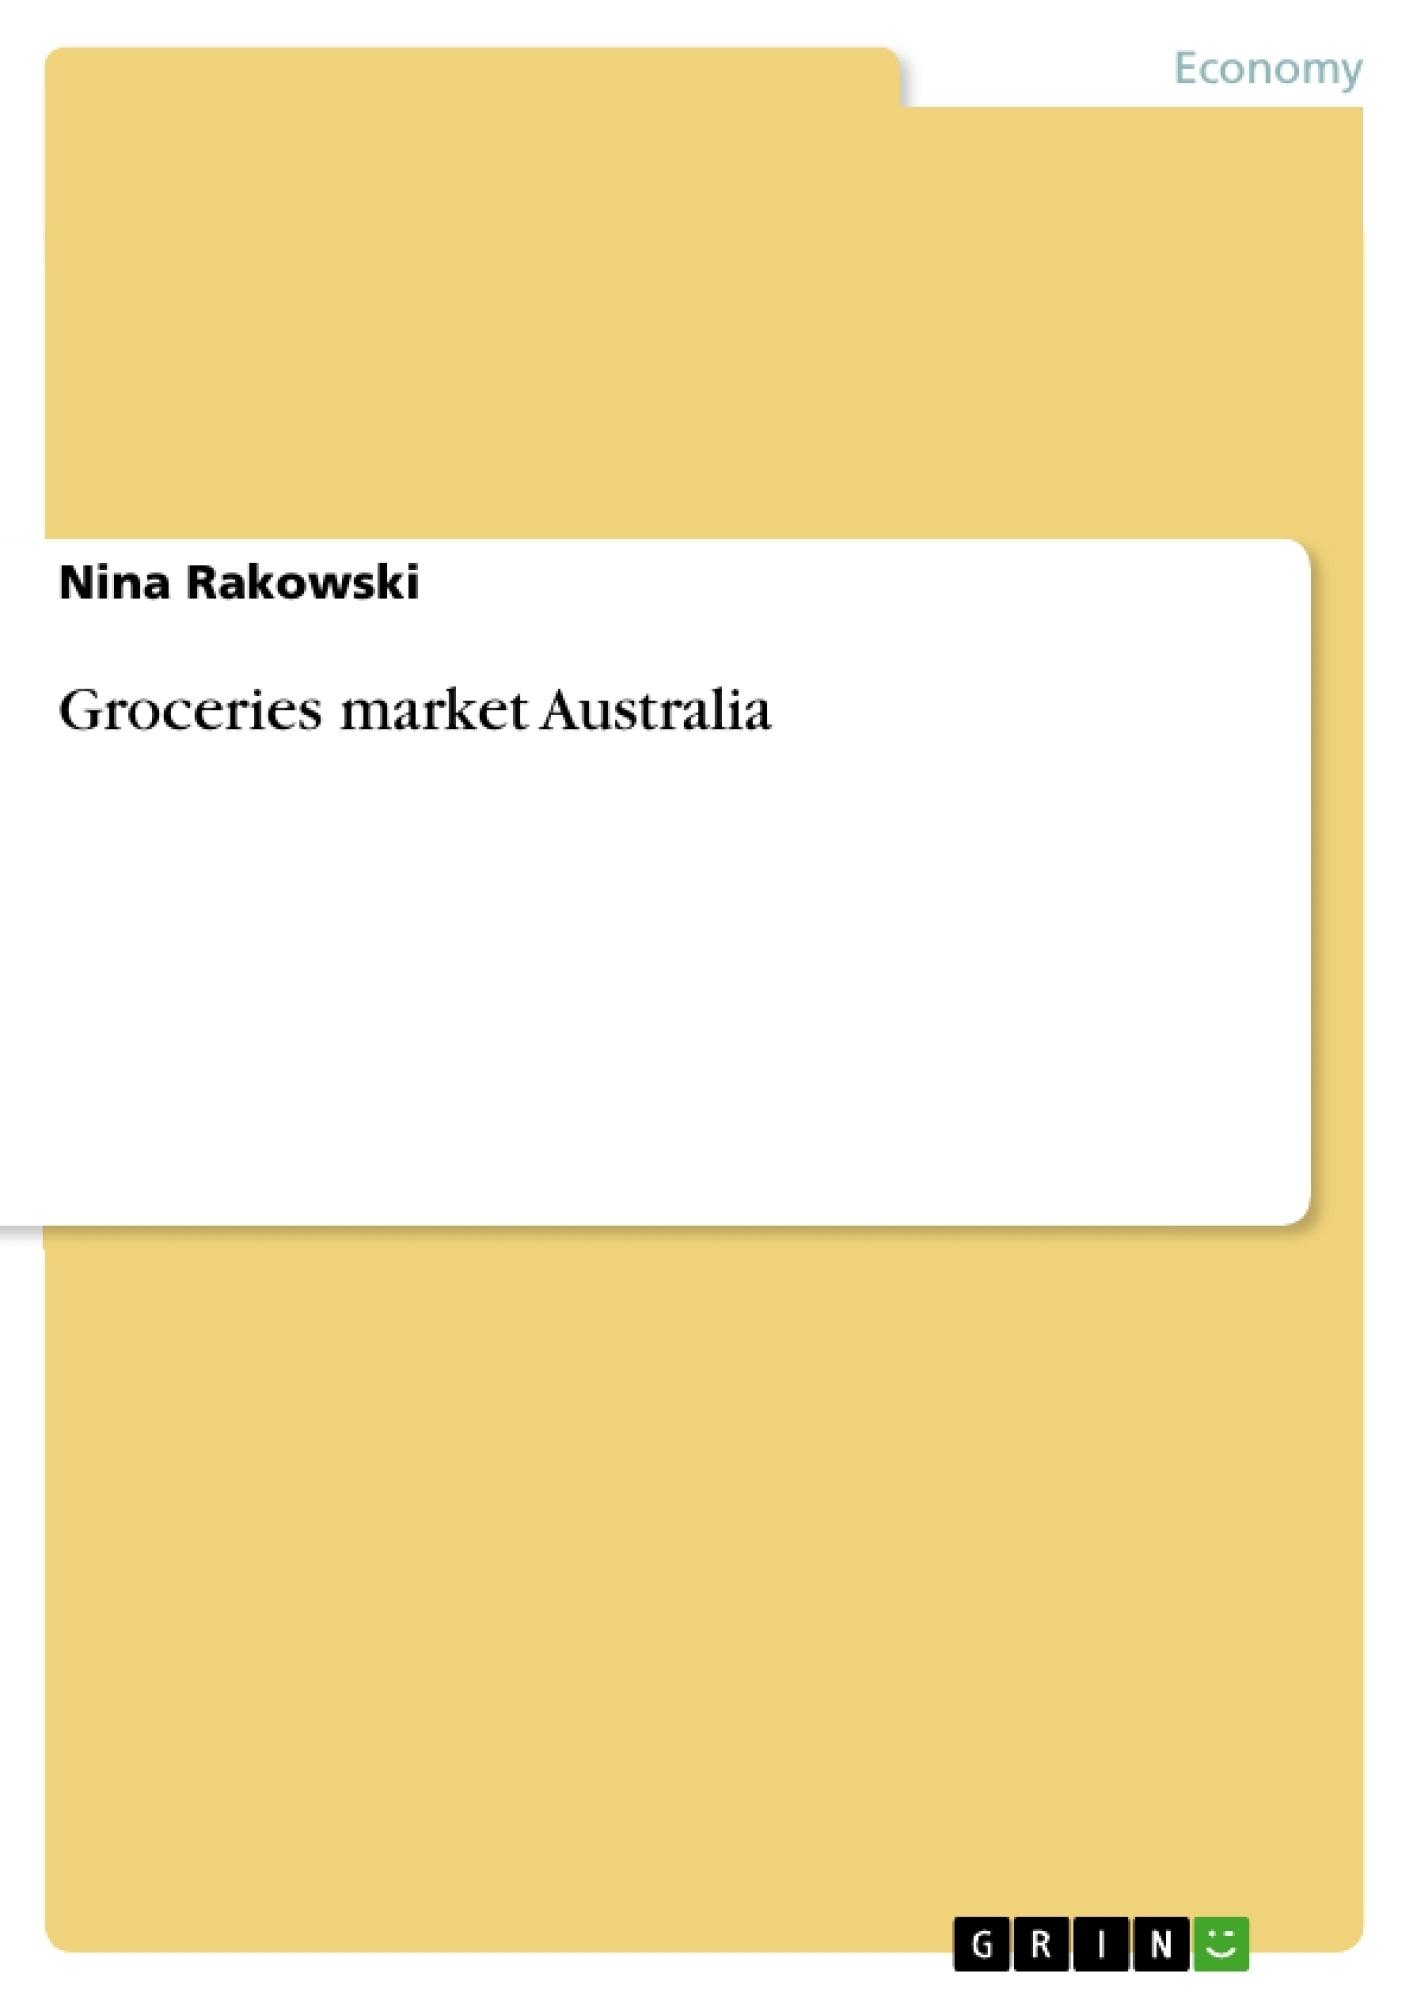 Title: Groceries market Australia